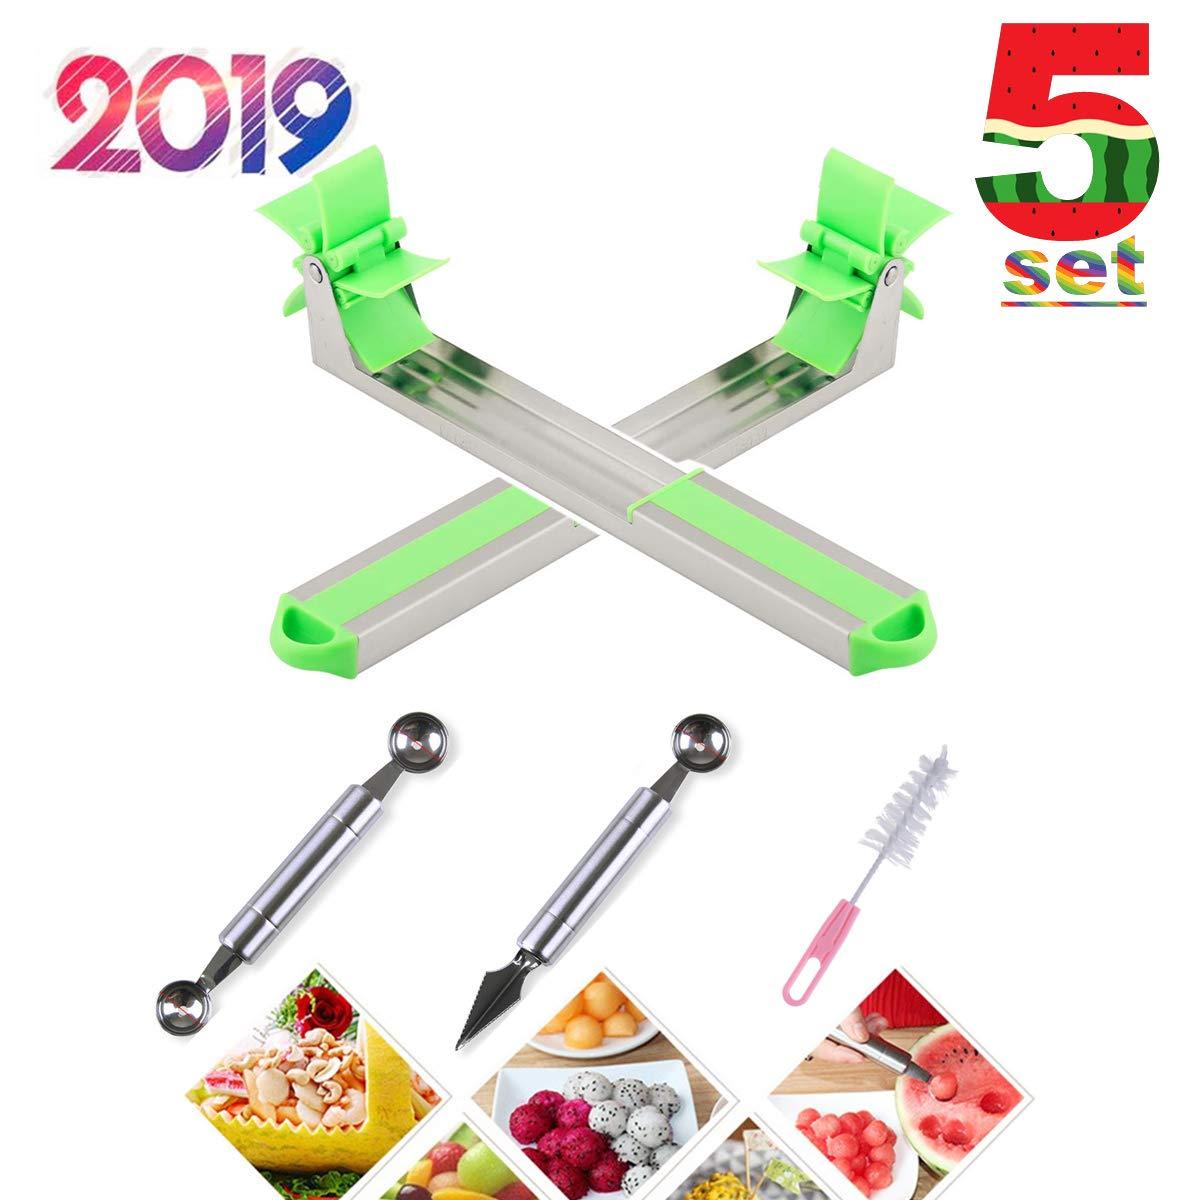 Windmill Watermelon Slicer Cutter,Stainless Steel Watermelon Cubes Slicer,Melon Baller Fruit Carving Knife Corer Fruit Tools Kitchen Gadgets by Freeaurora